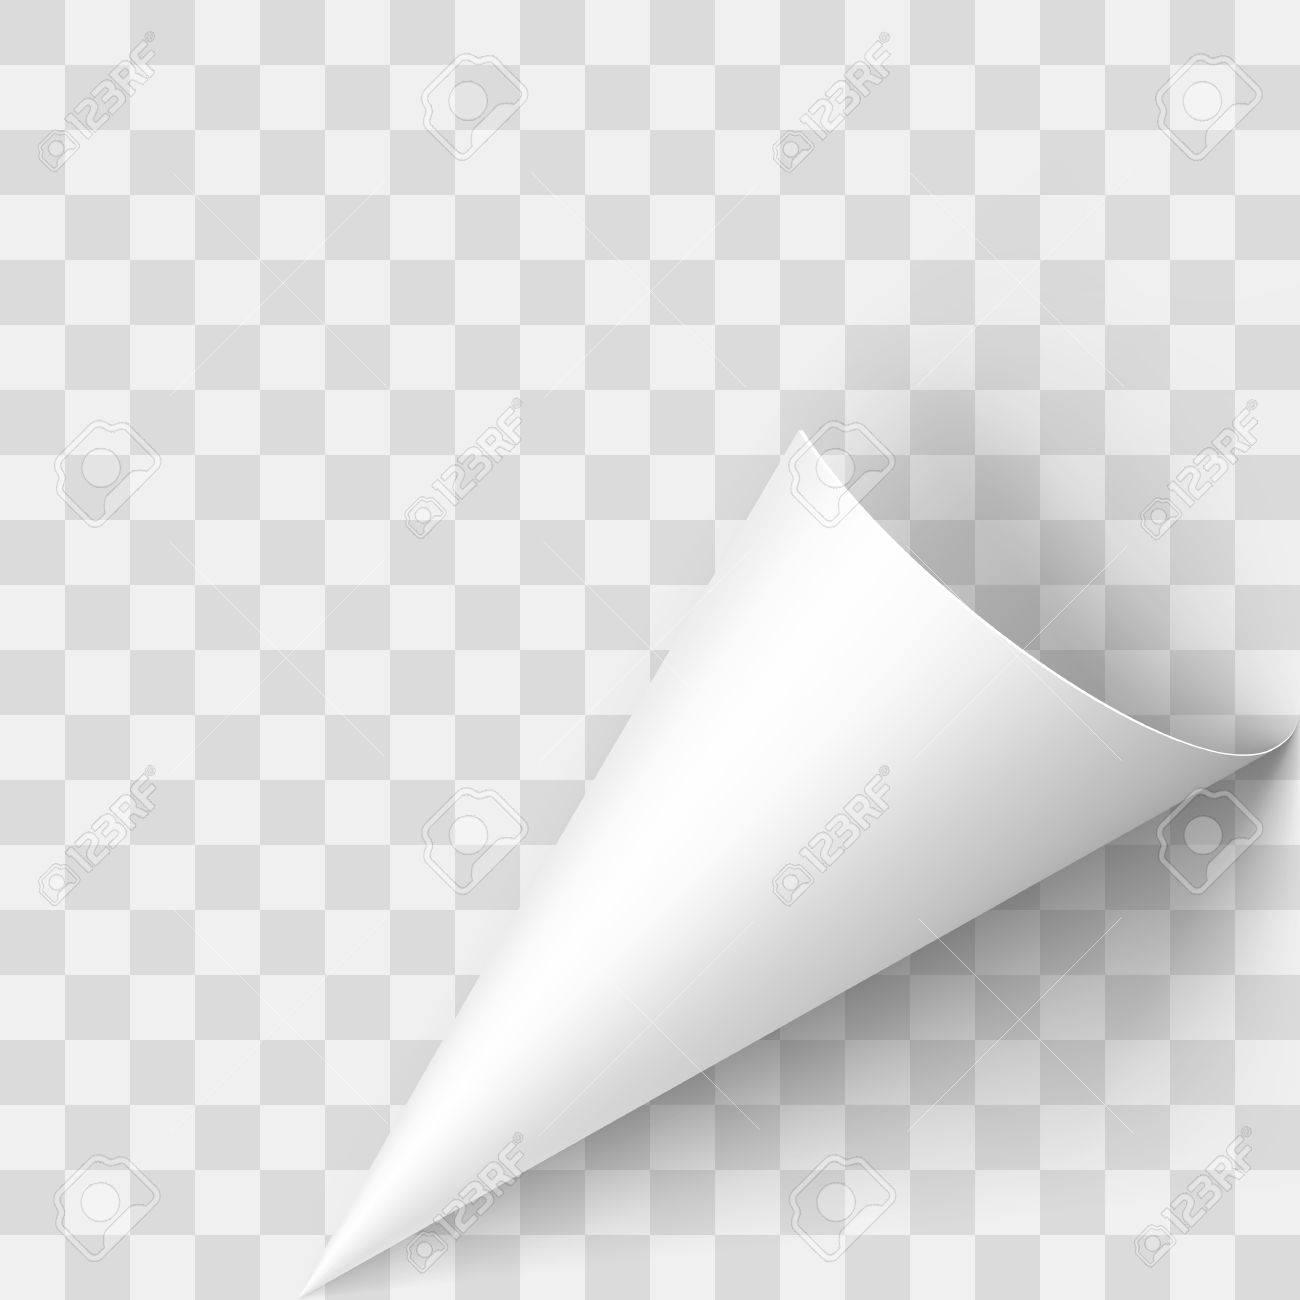 Illustration of Transperent Page Corner. Template Design for Creative Idea - 53108614